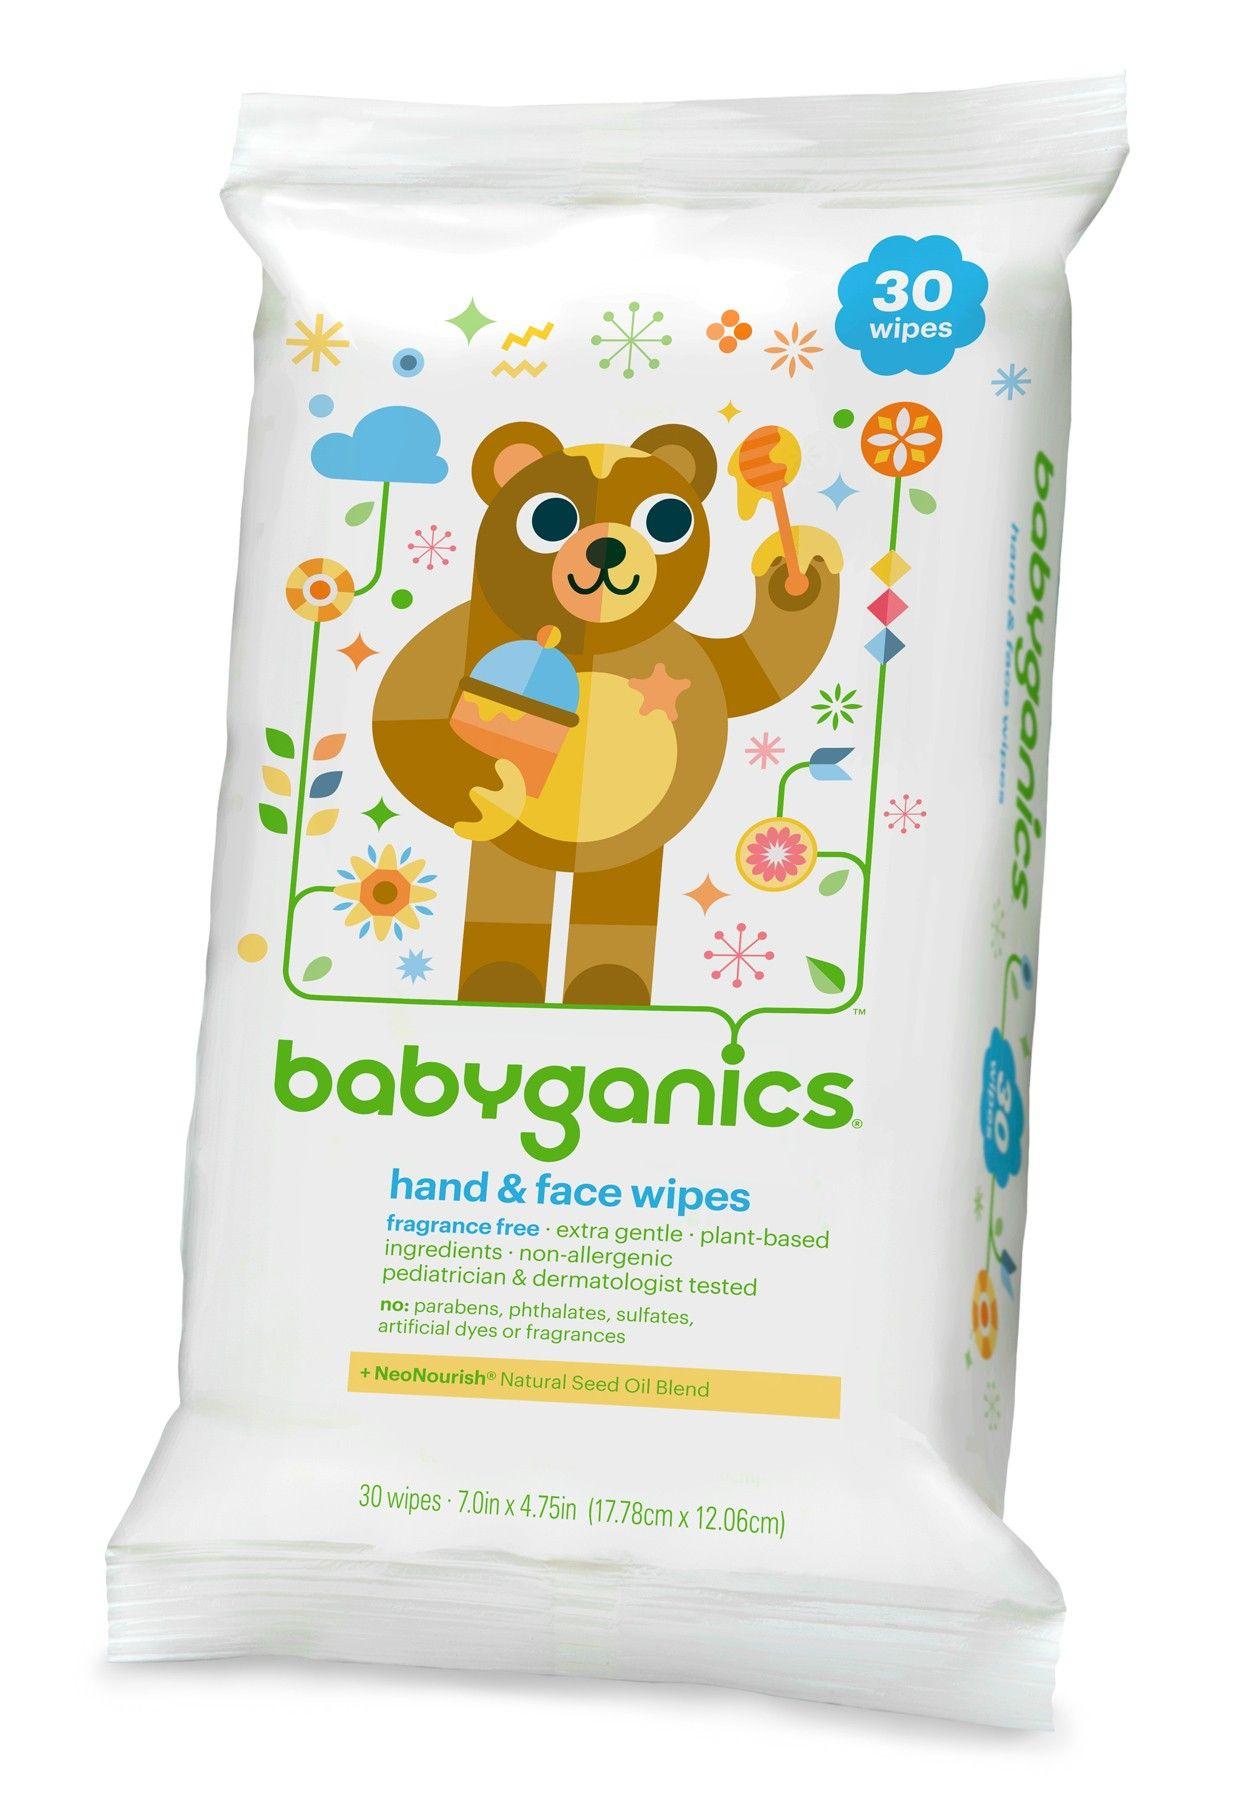 Babyganics Hand Face Wipes Fragrance Free Huggle Baby Wipe